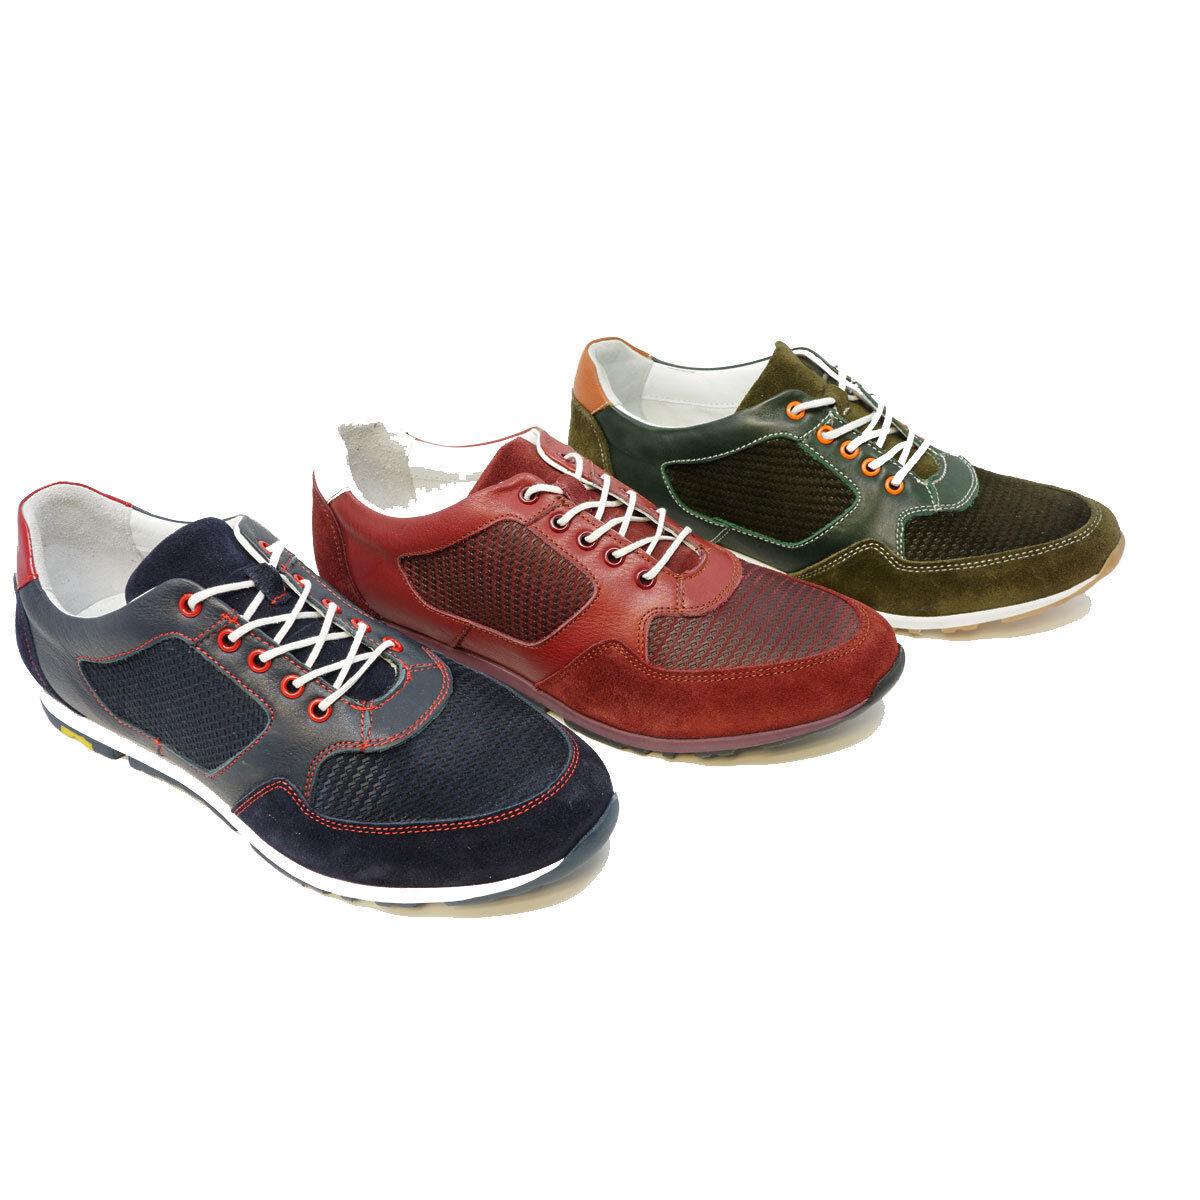 Futoli - Fashion Sneaker For Men